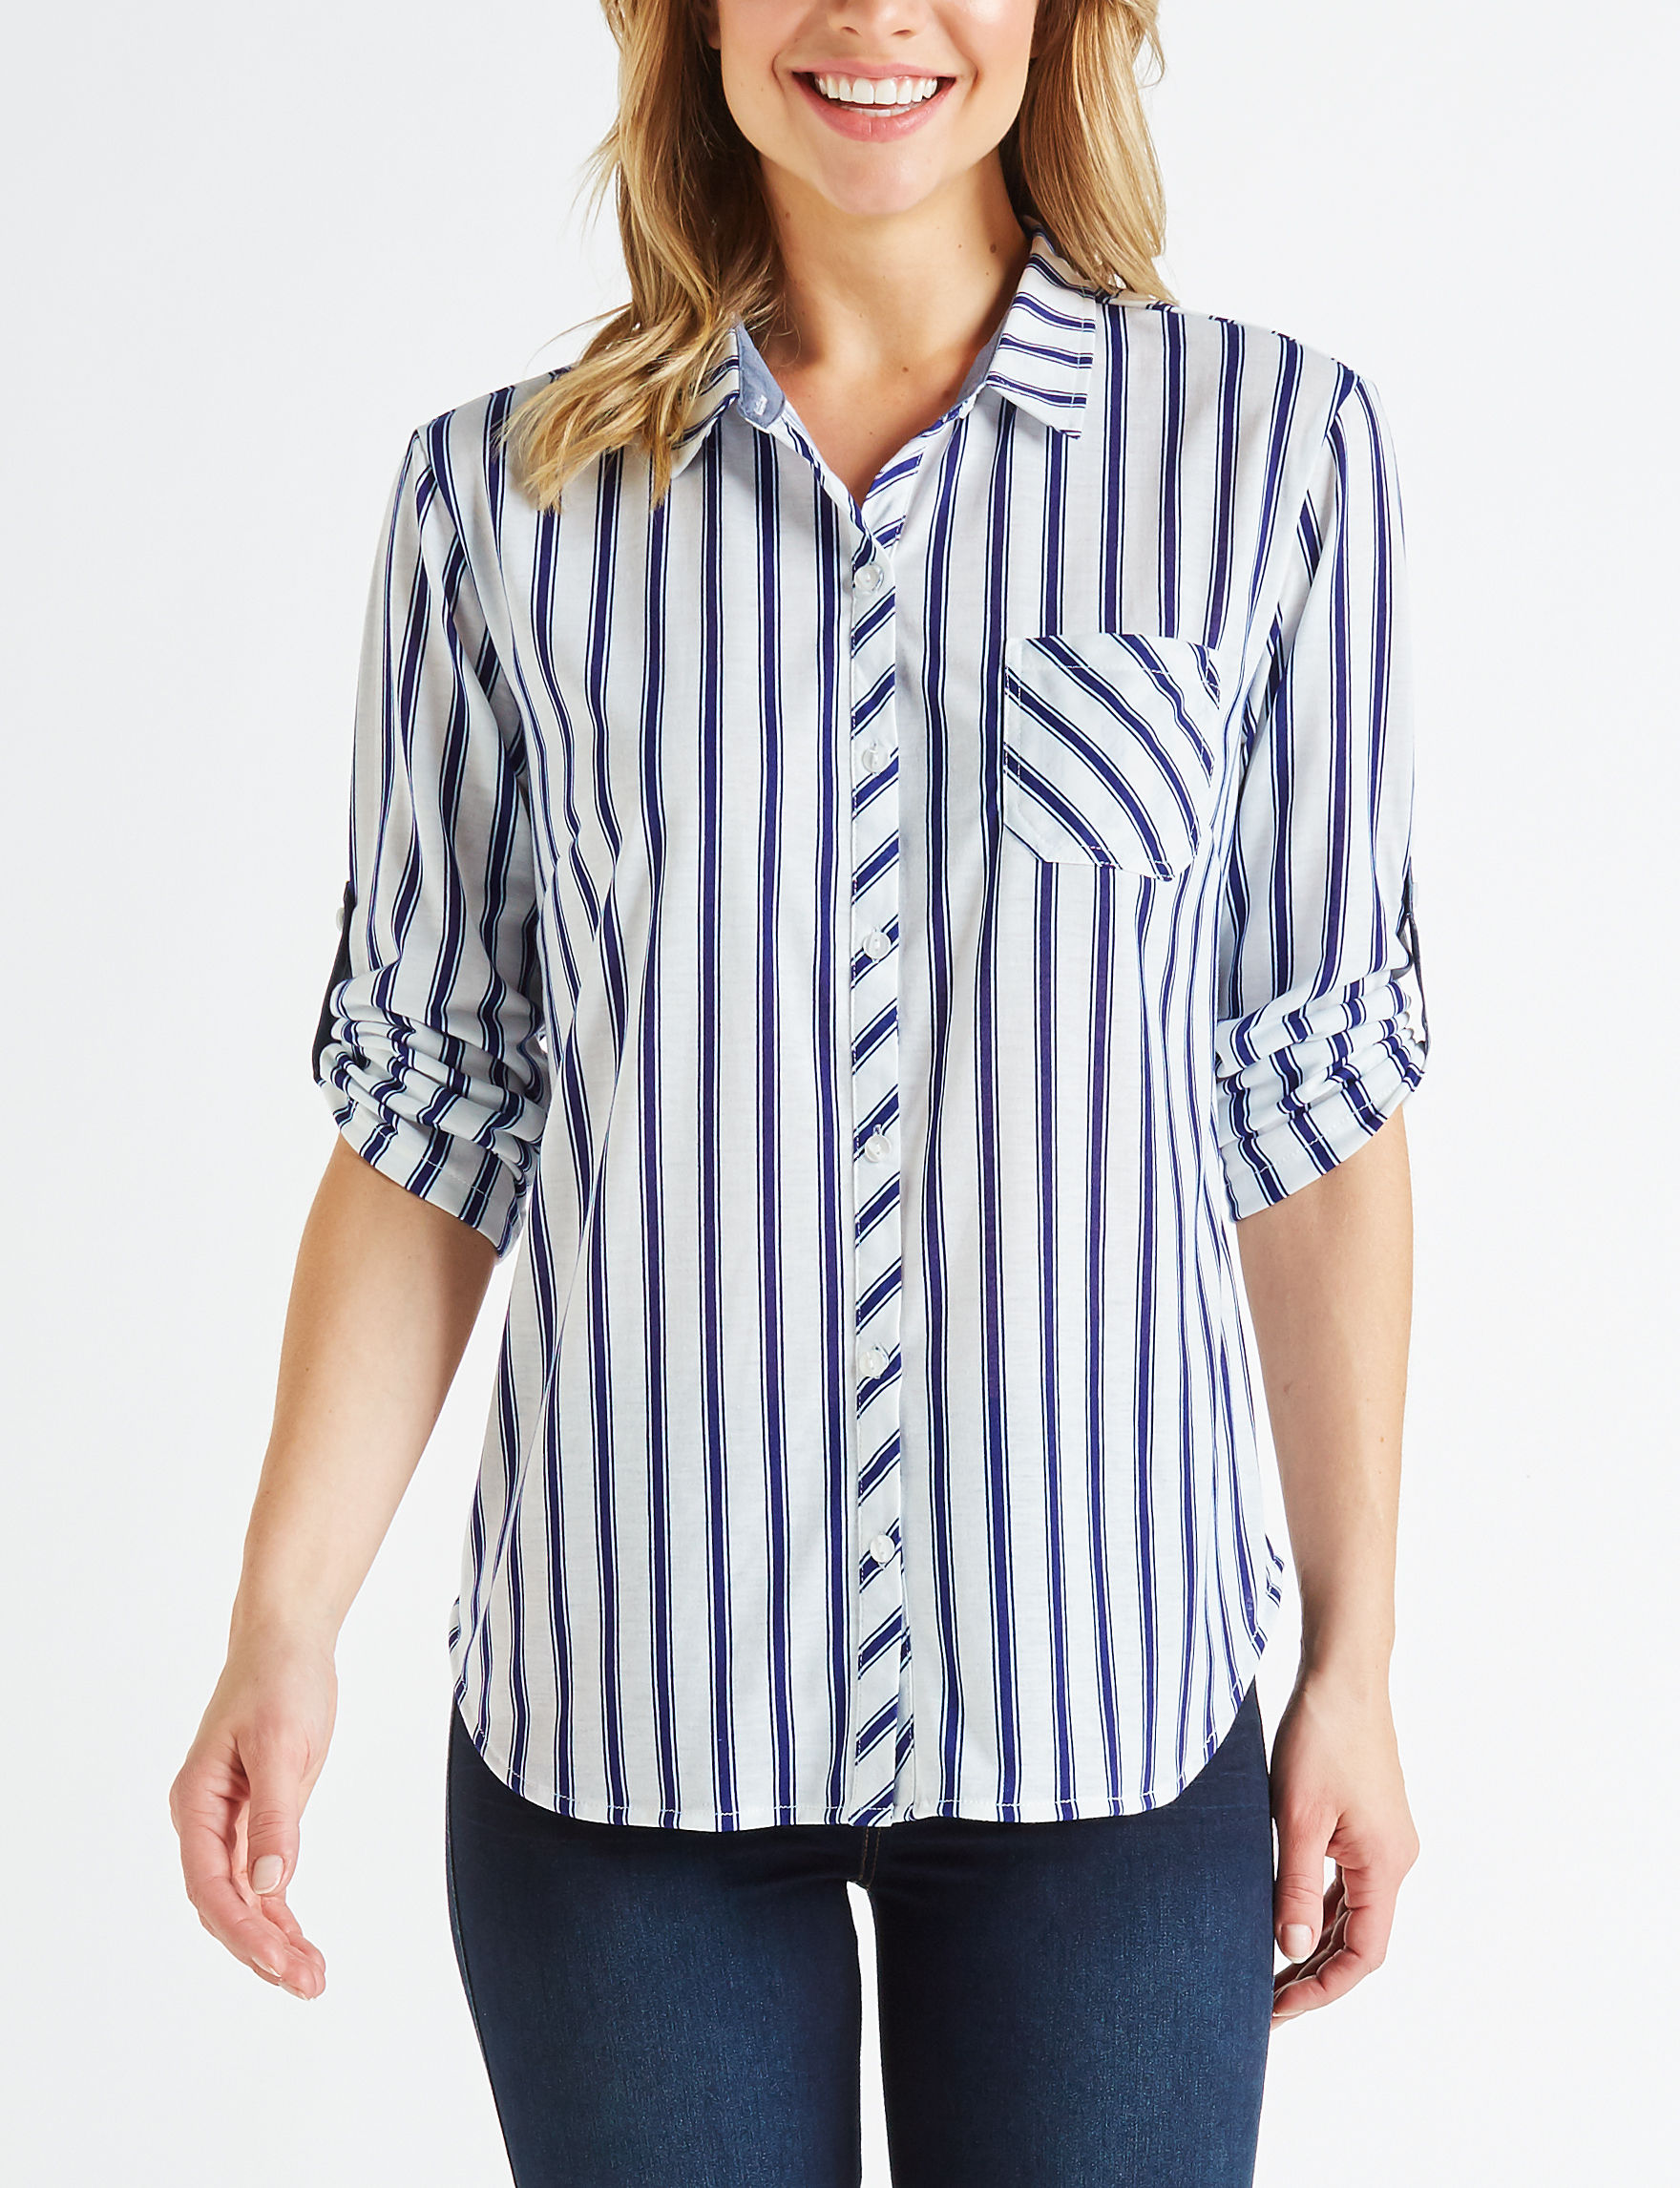 Eden & Olivia White / Navy Shirts & Blouses